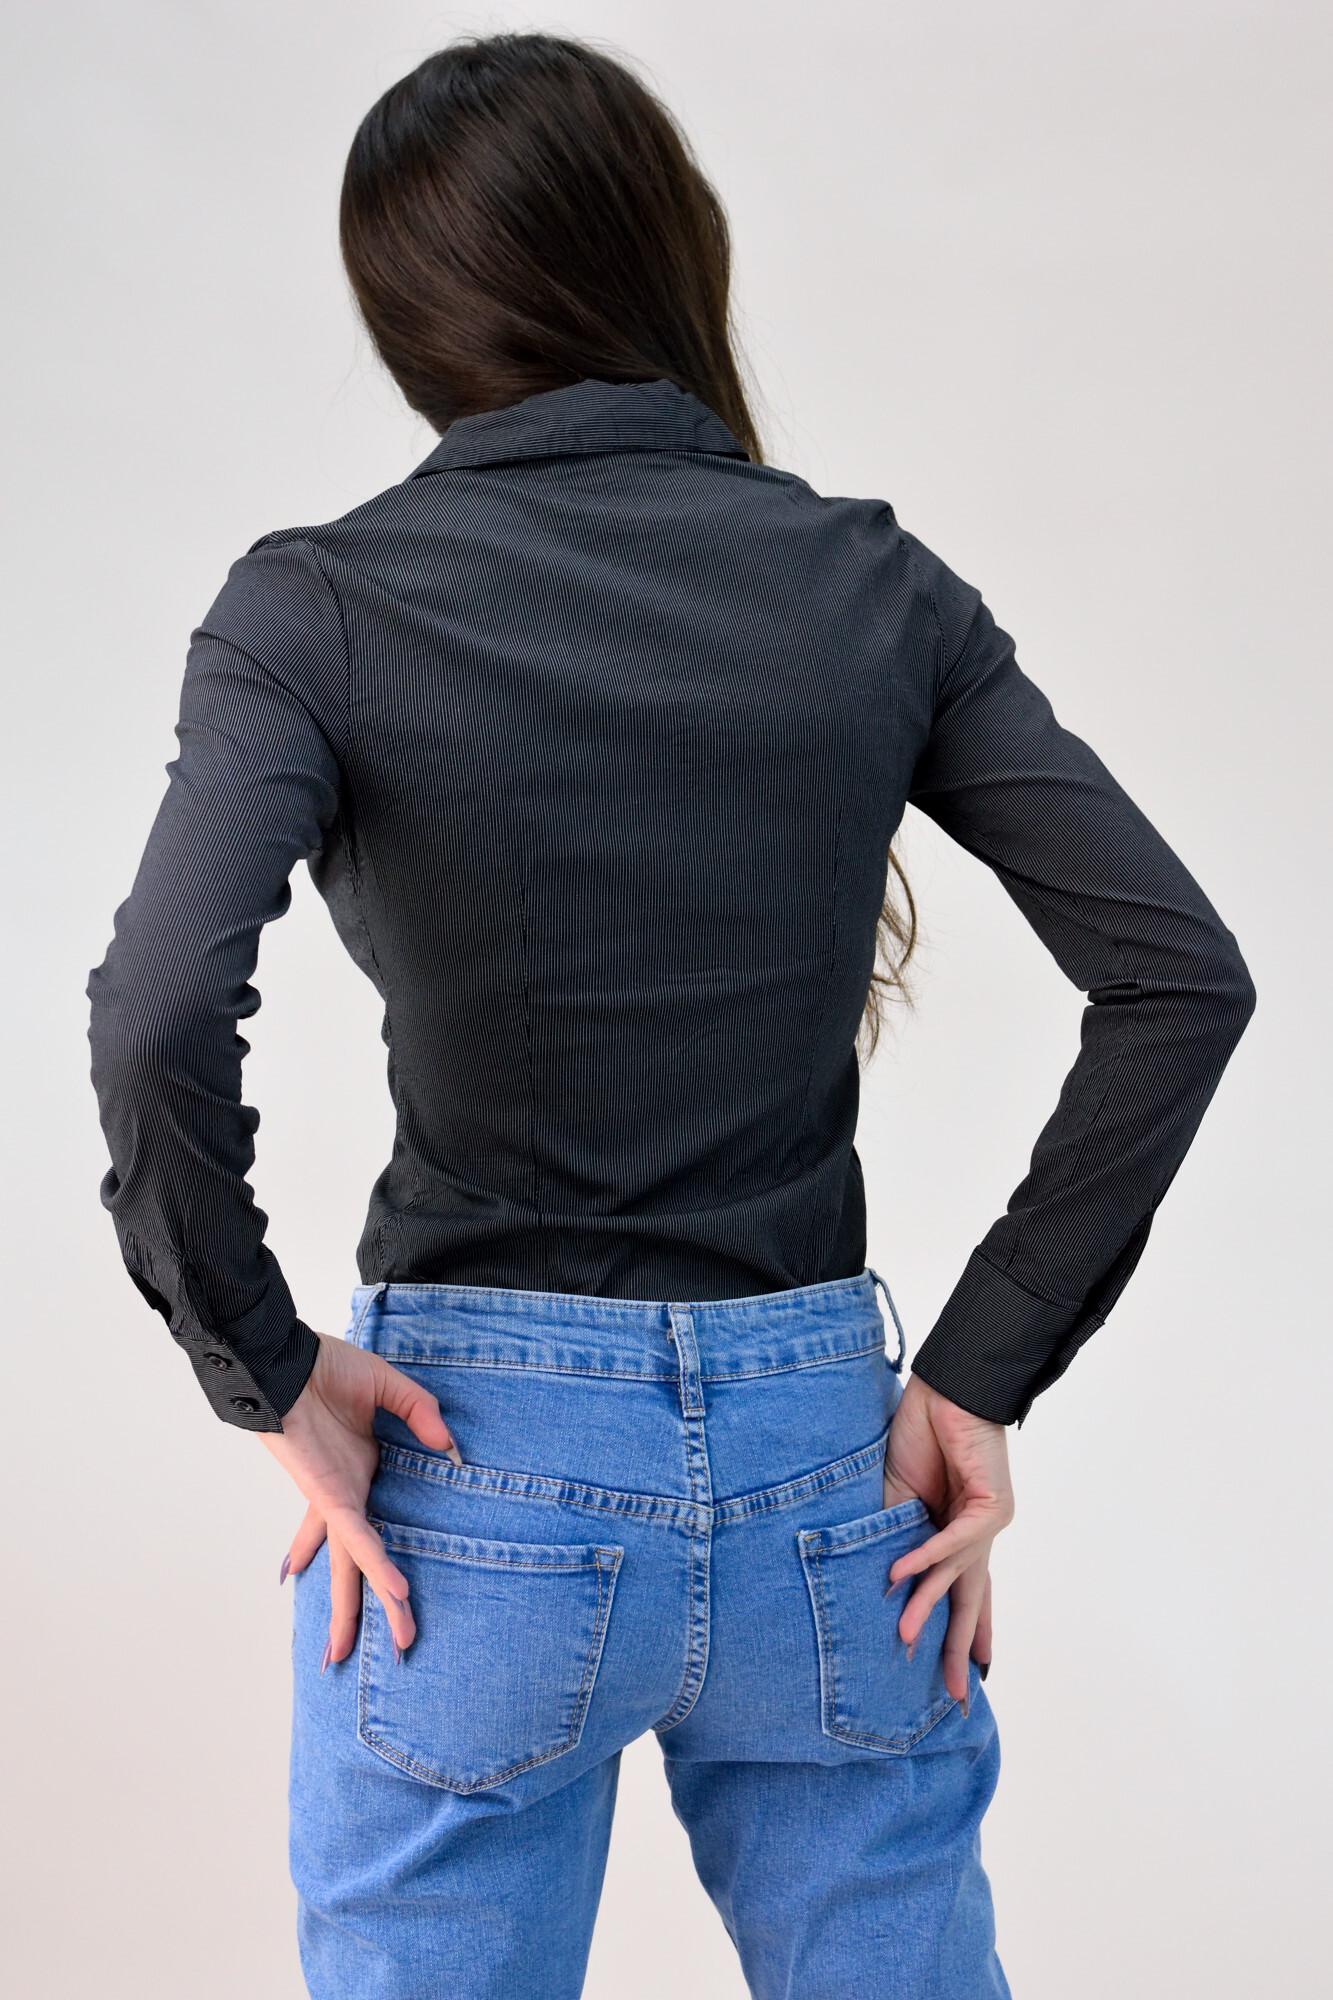 f7599f897c8a Κορμάκι πουκάμισο με λεπτή ρίγα. Tap to expand